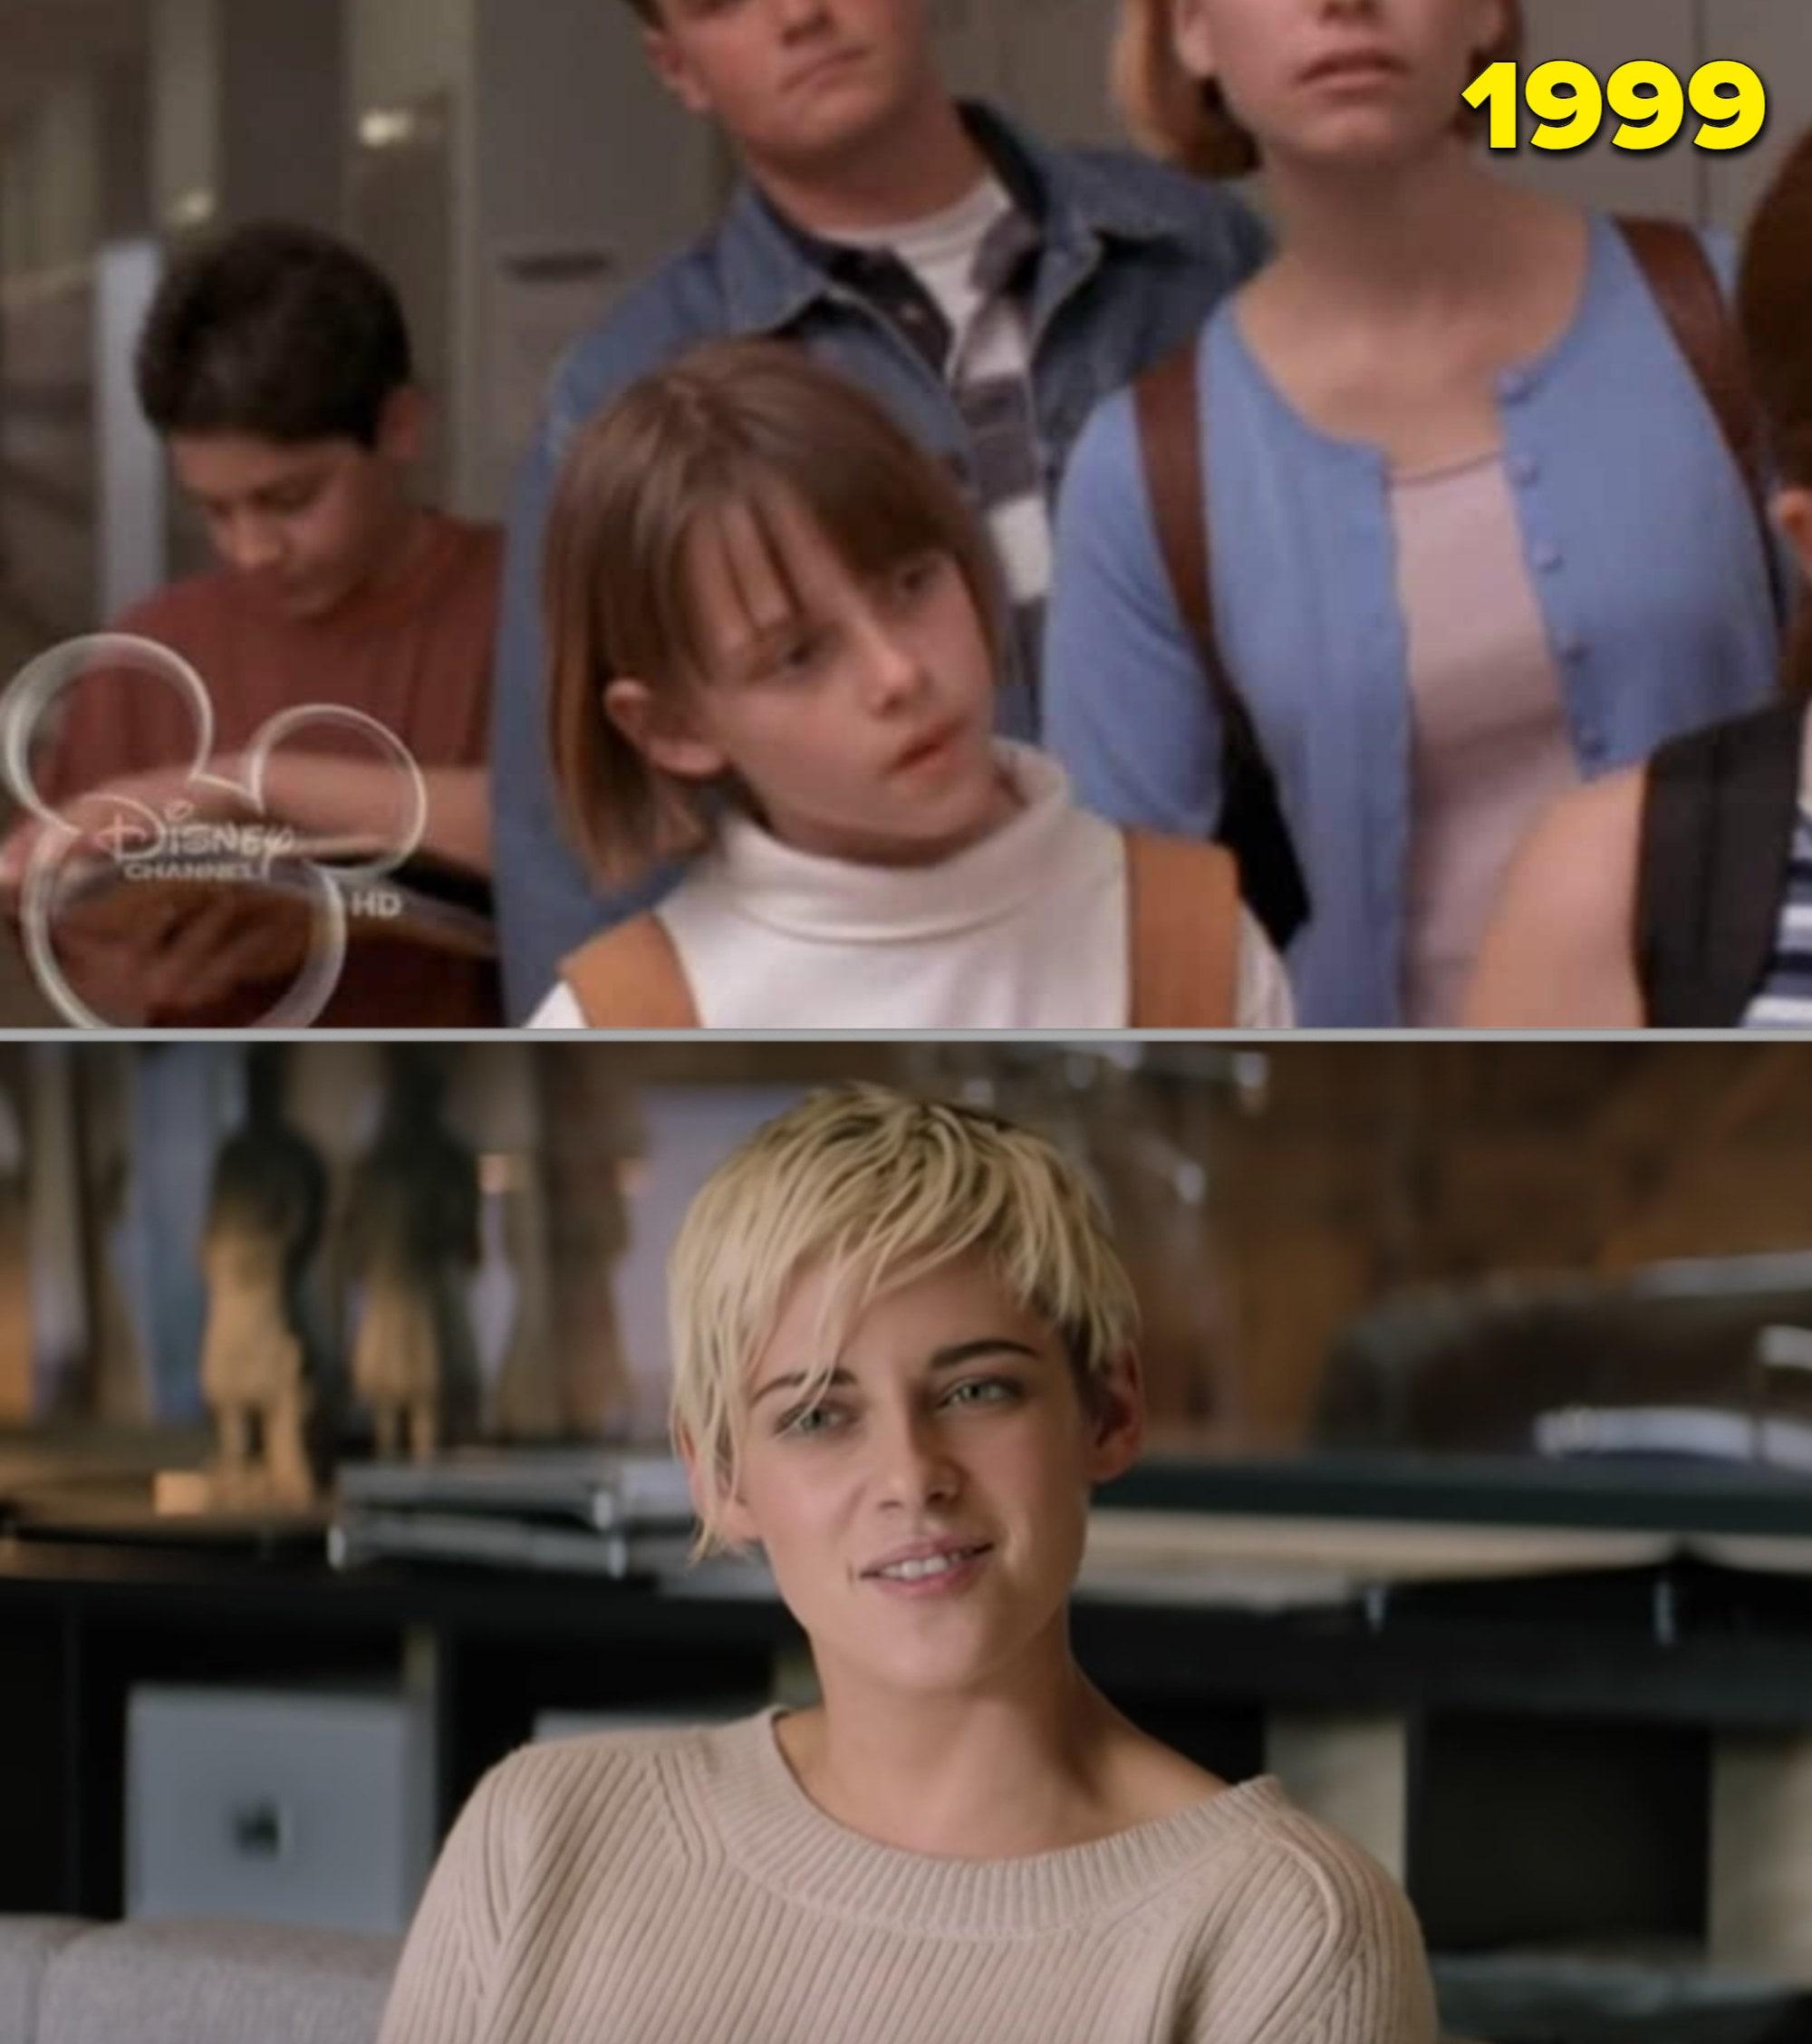 Kristen Stewart criança e adulta numa entrevista